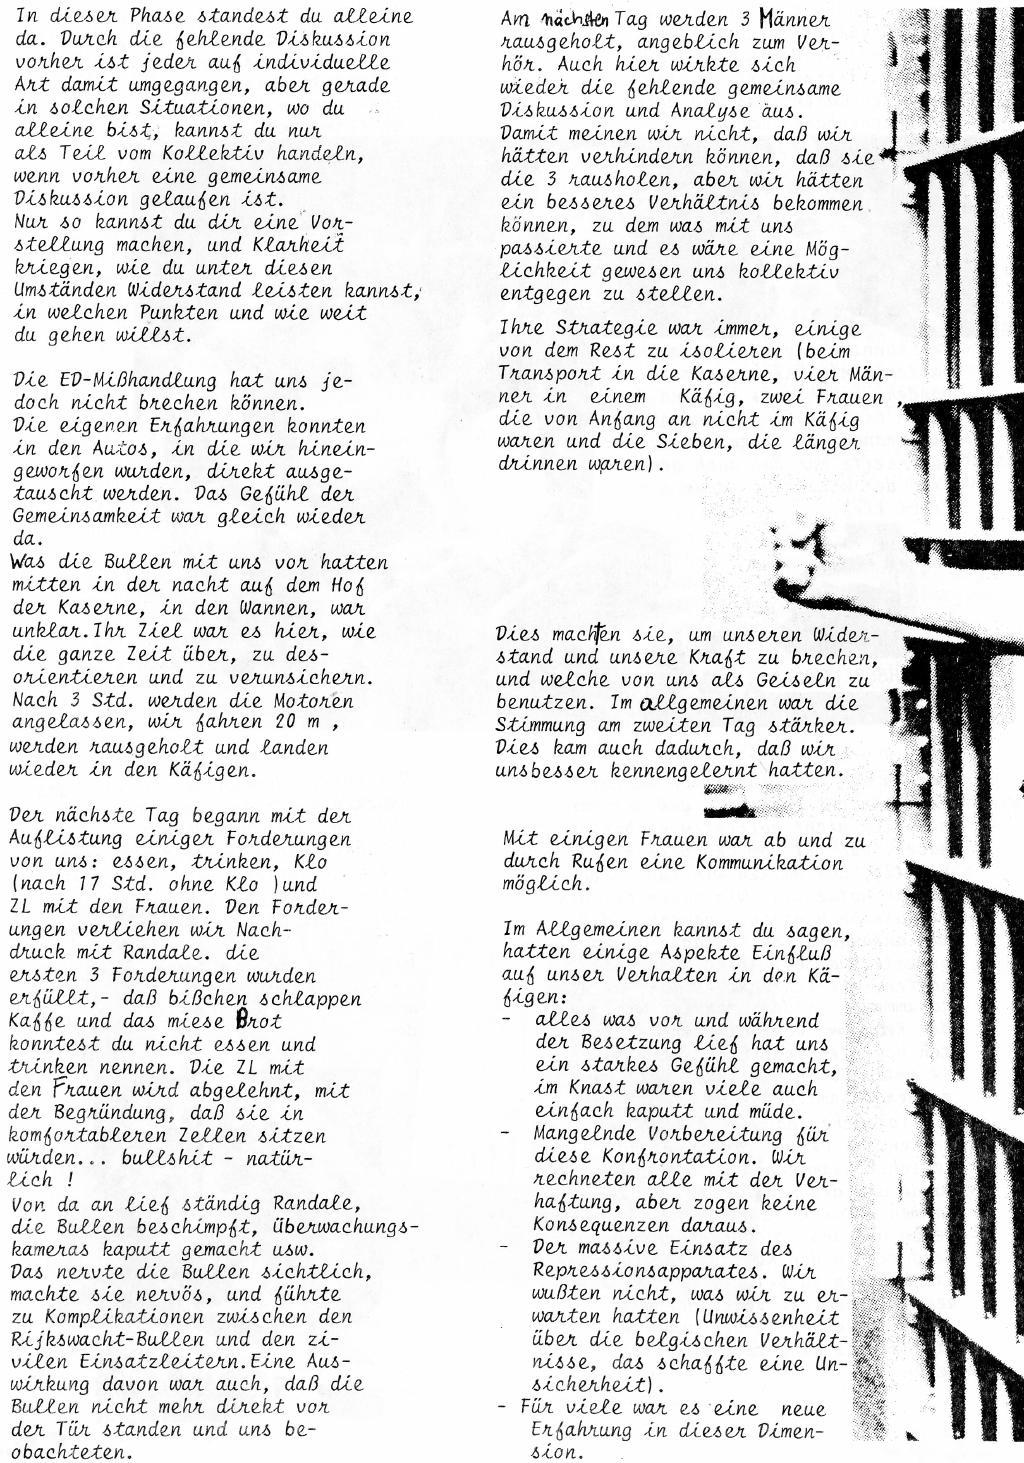 Belgien_Doku_Besetzung_EG_Kommission_1989_055